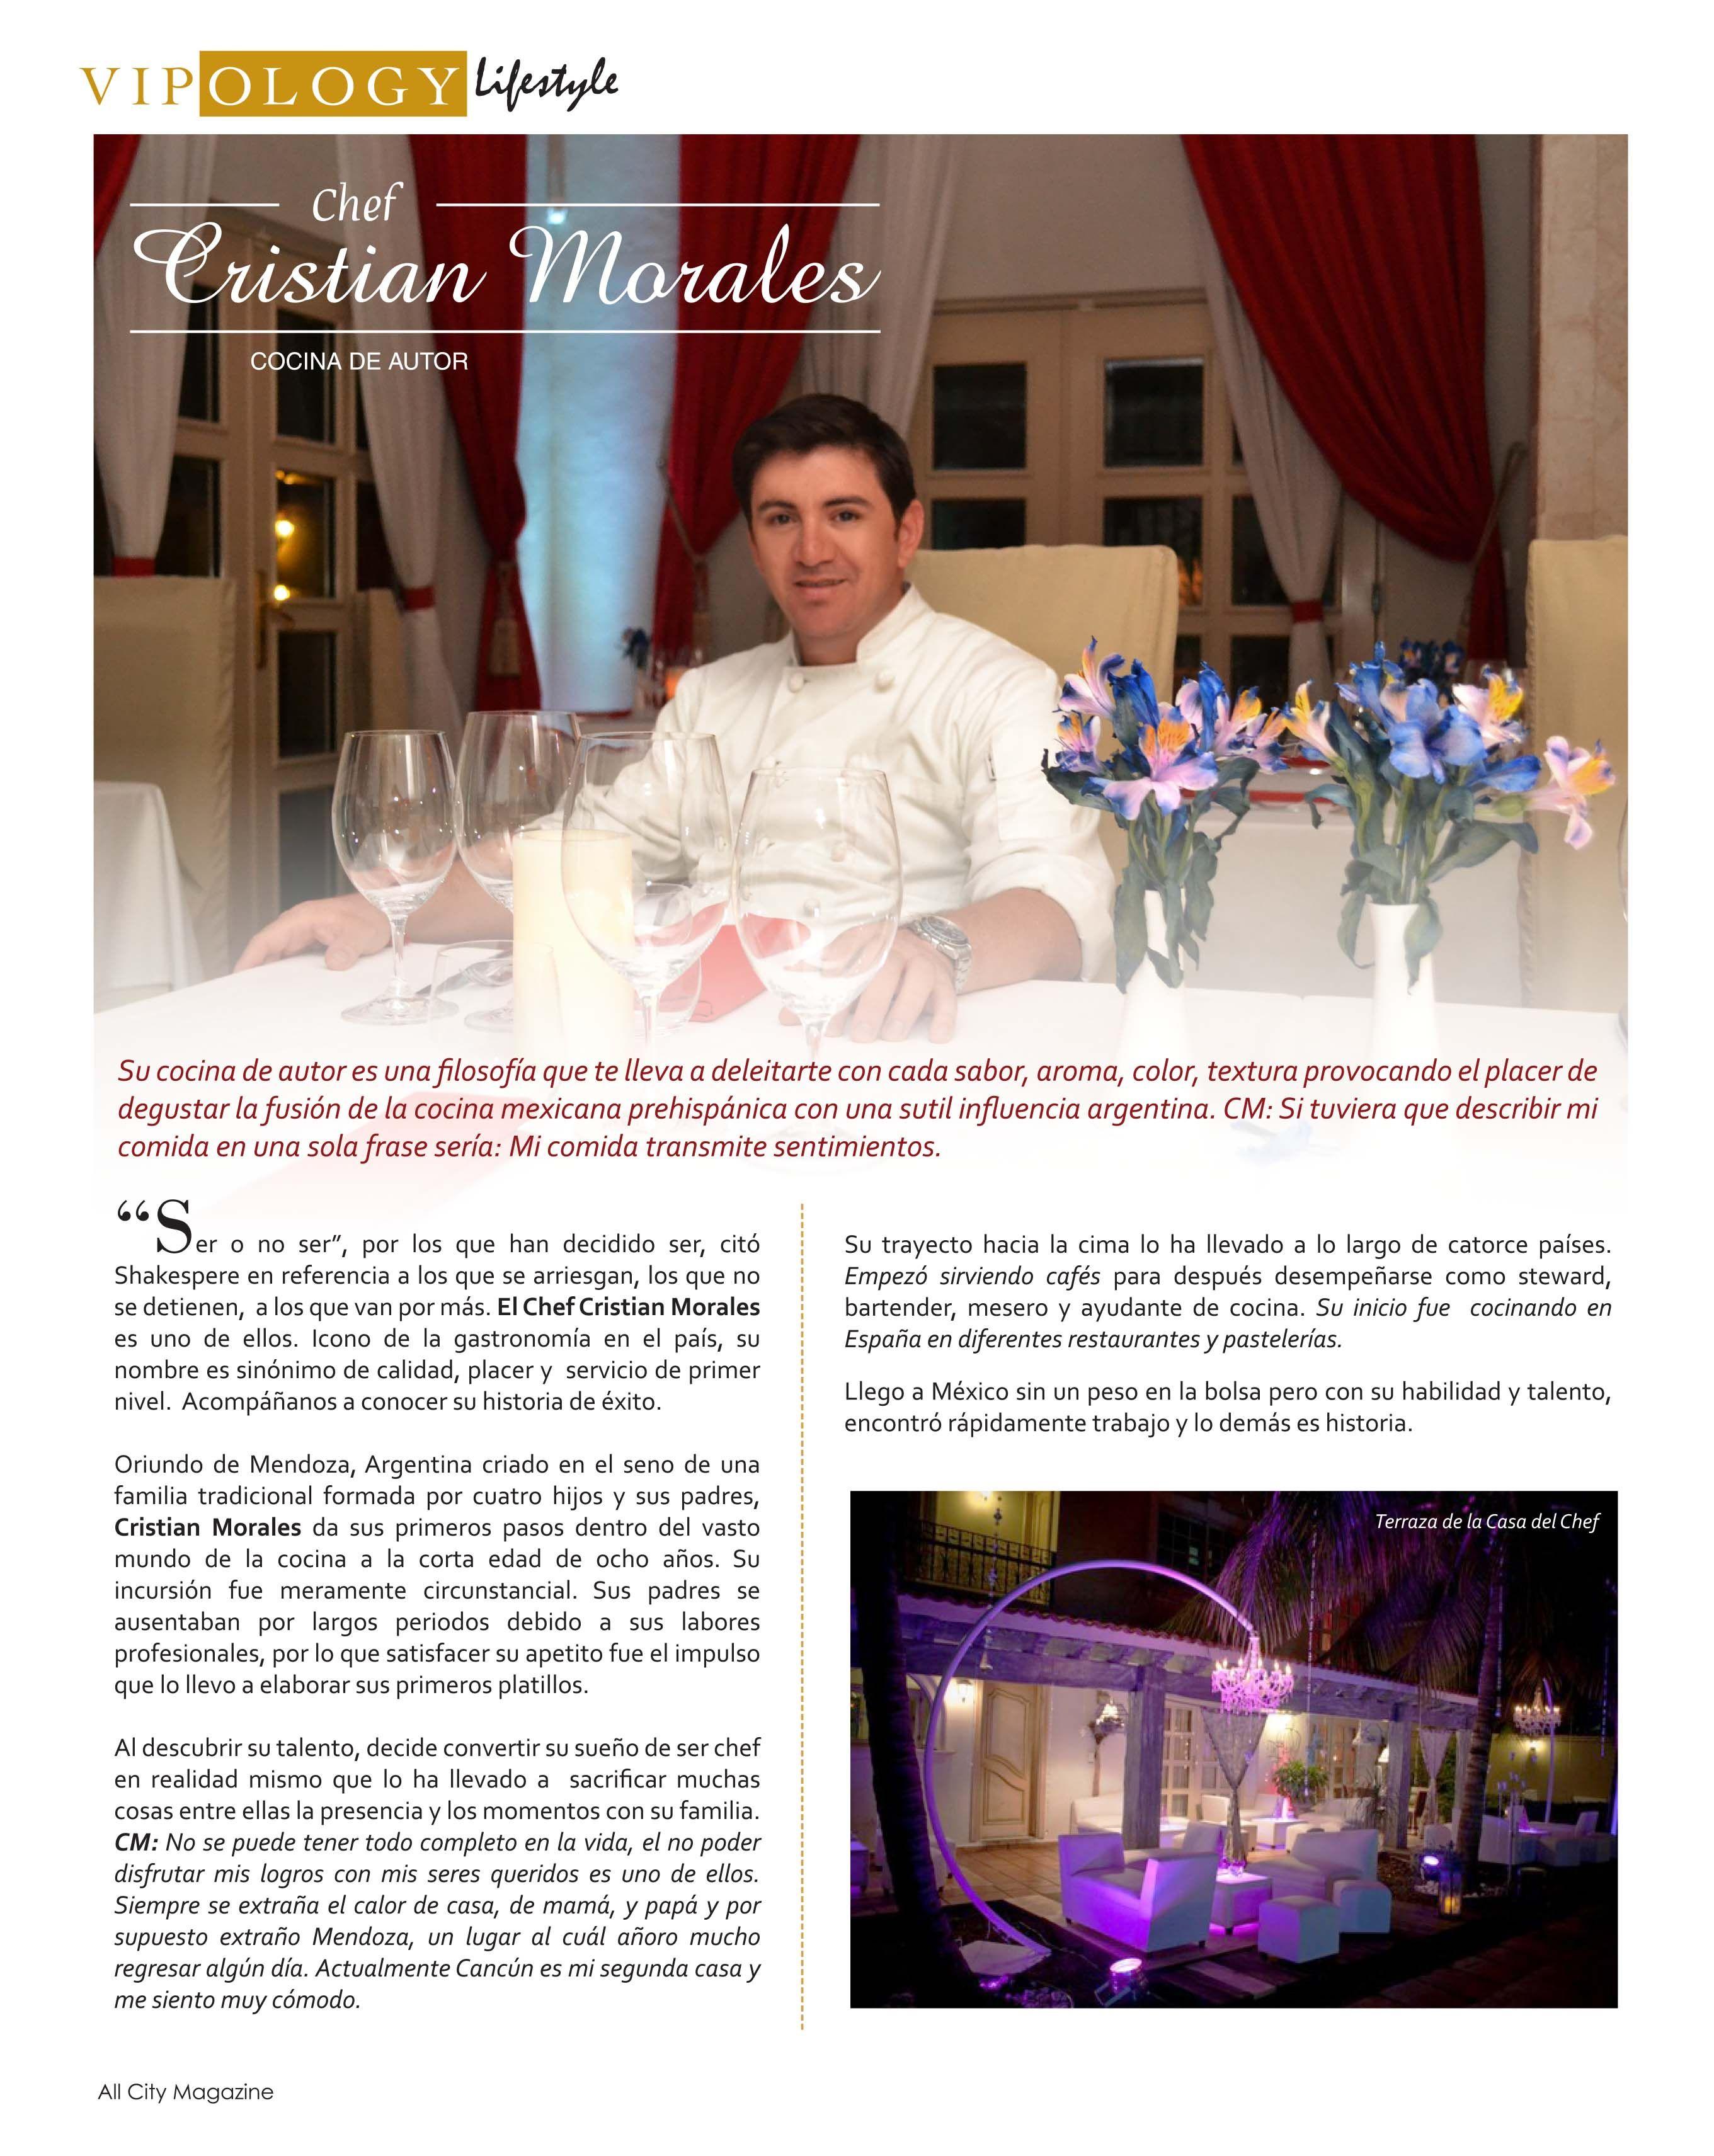 Embajador Vipology Chef Cristian Morales